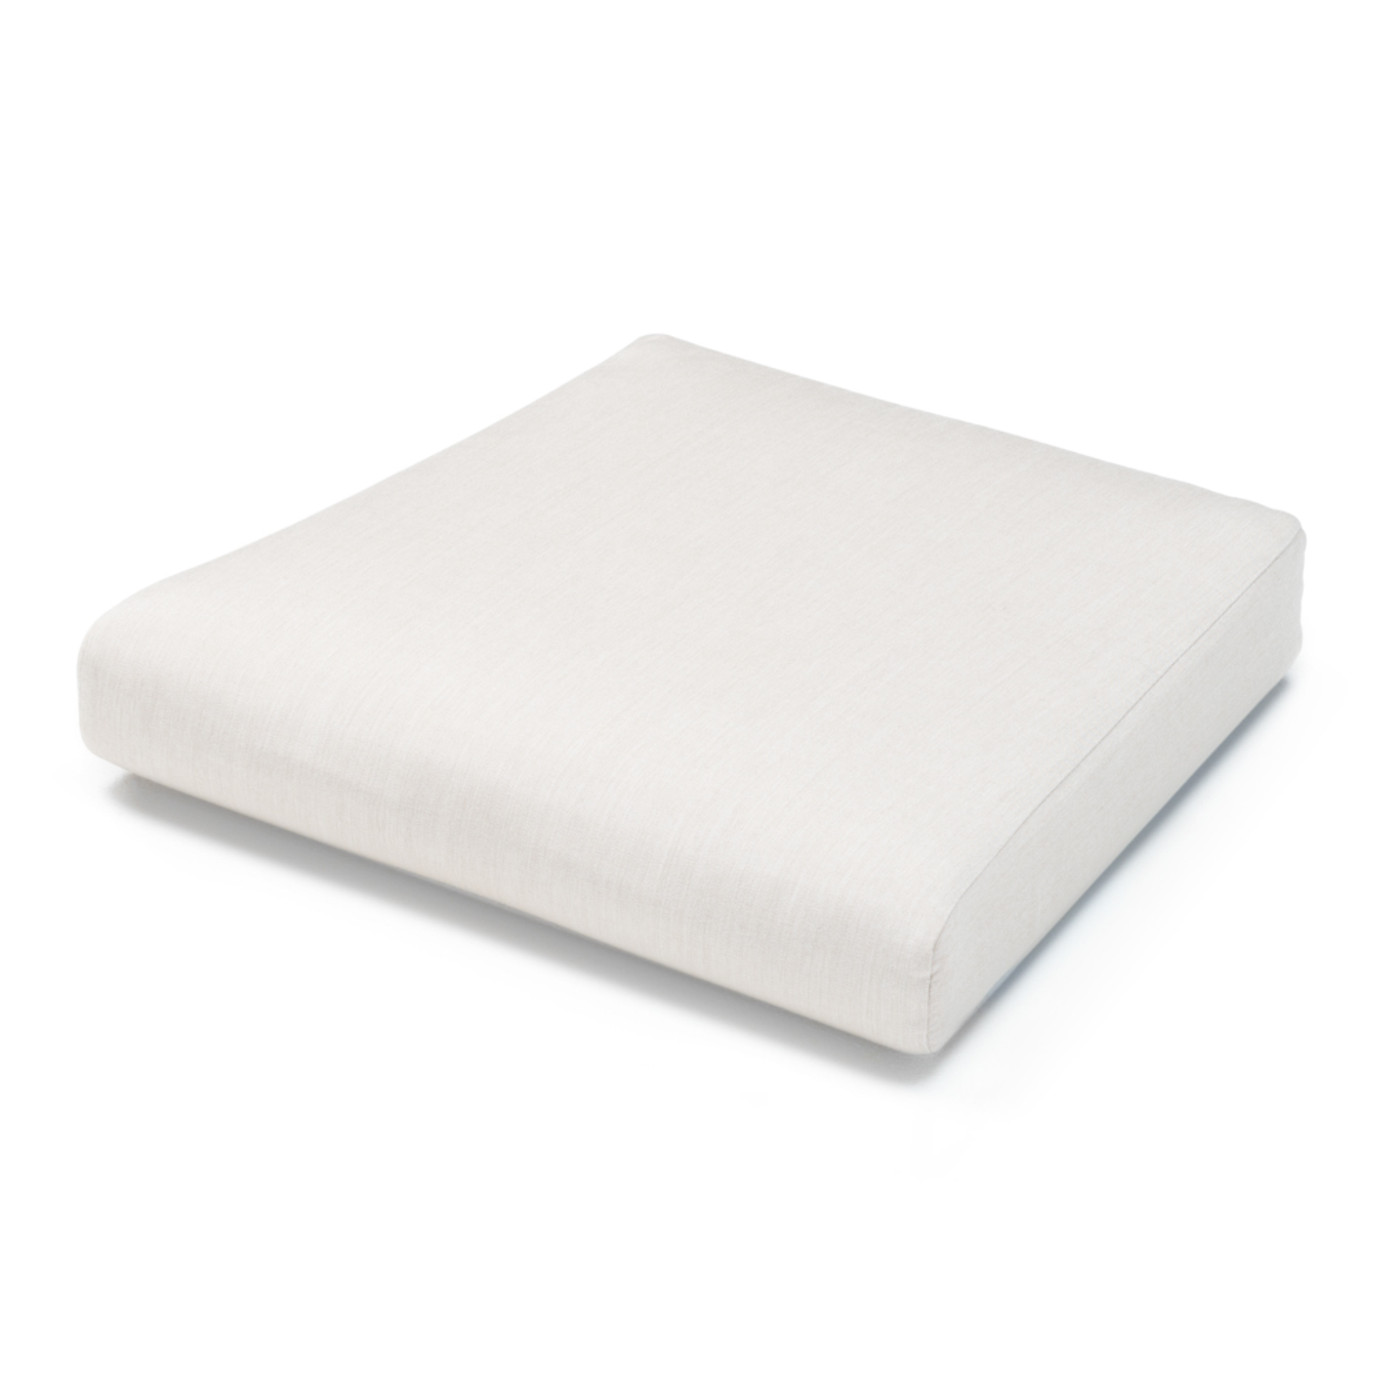 Portofino Sling Dining Cushion - Space Gray